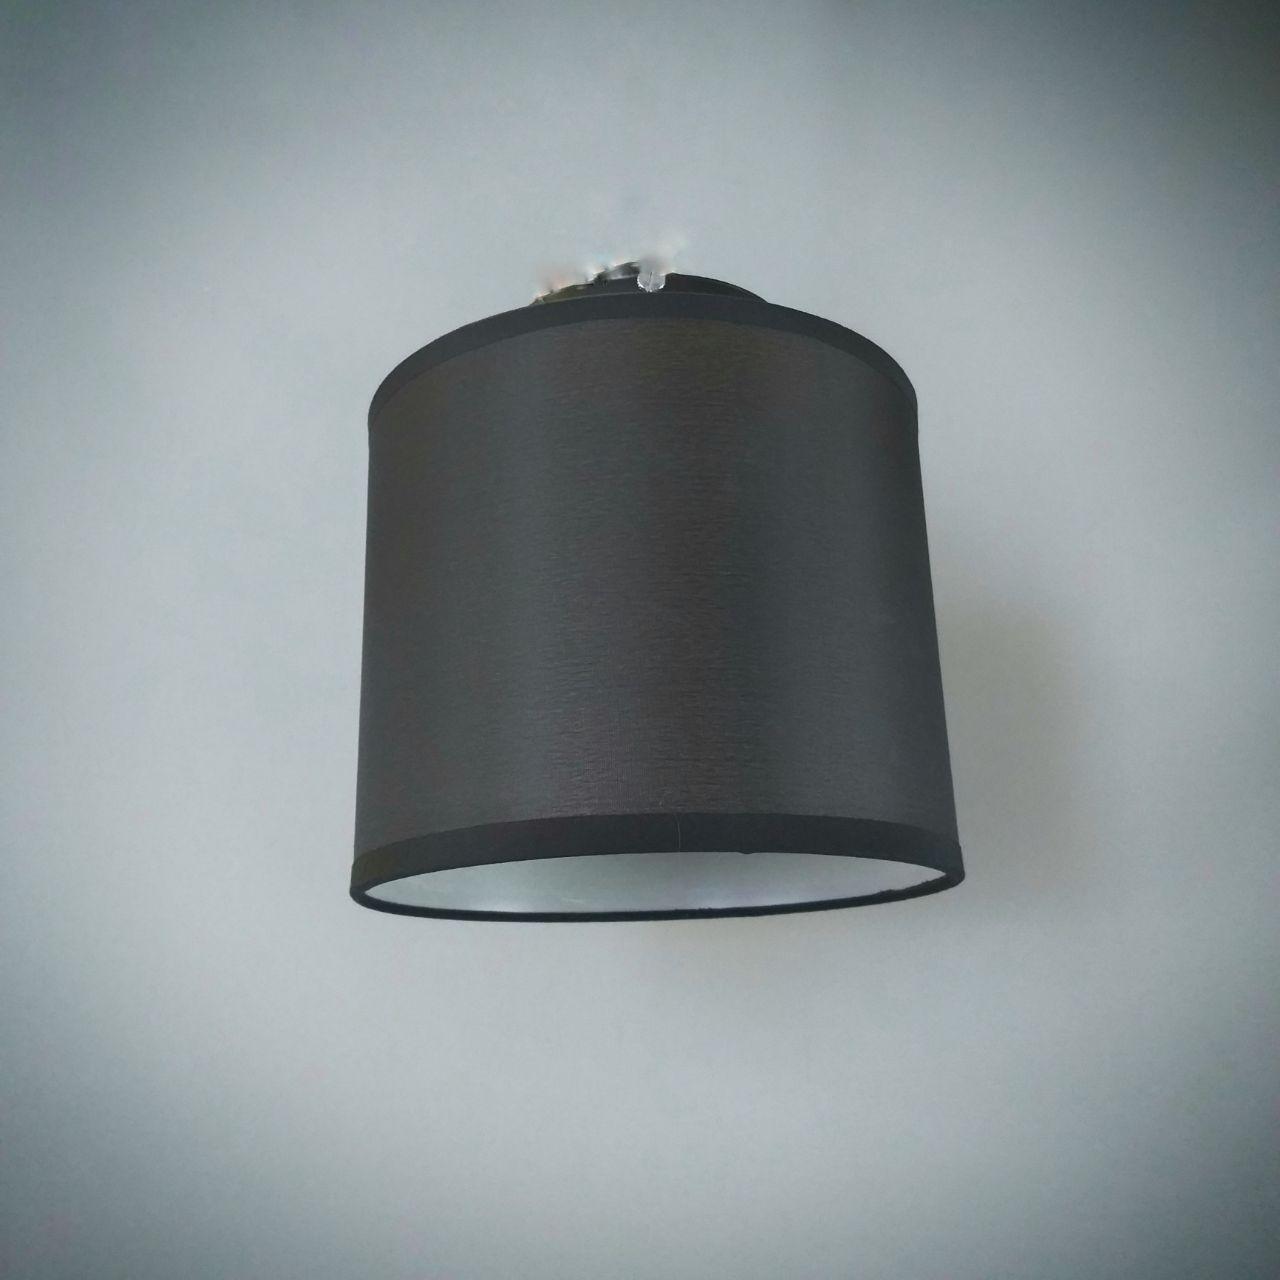 Люстра потолочная на одну лампу 29-XL011/1 BK(10шт) TK E27